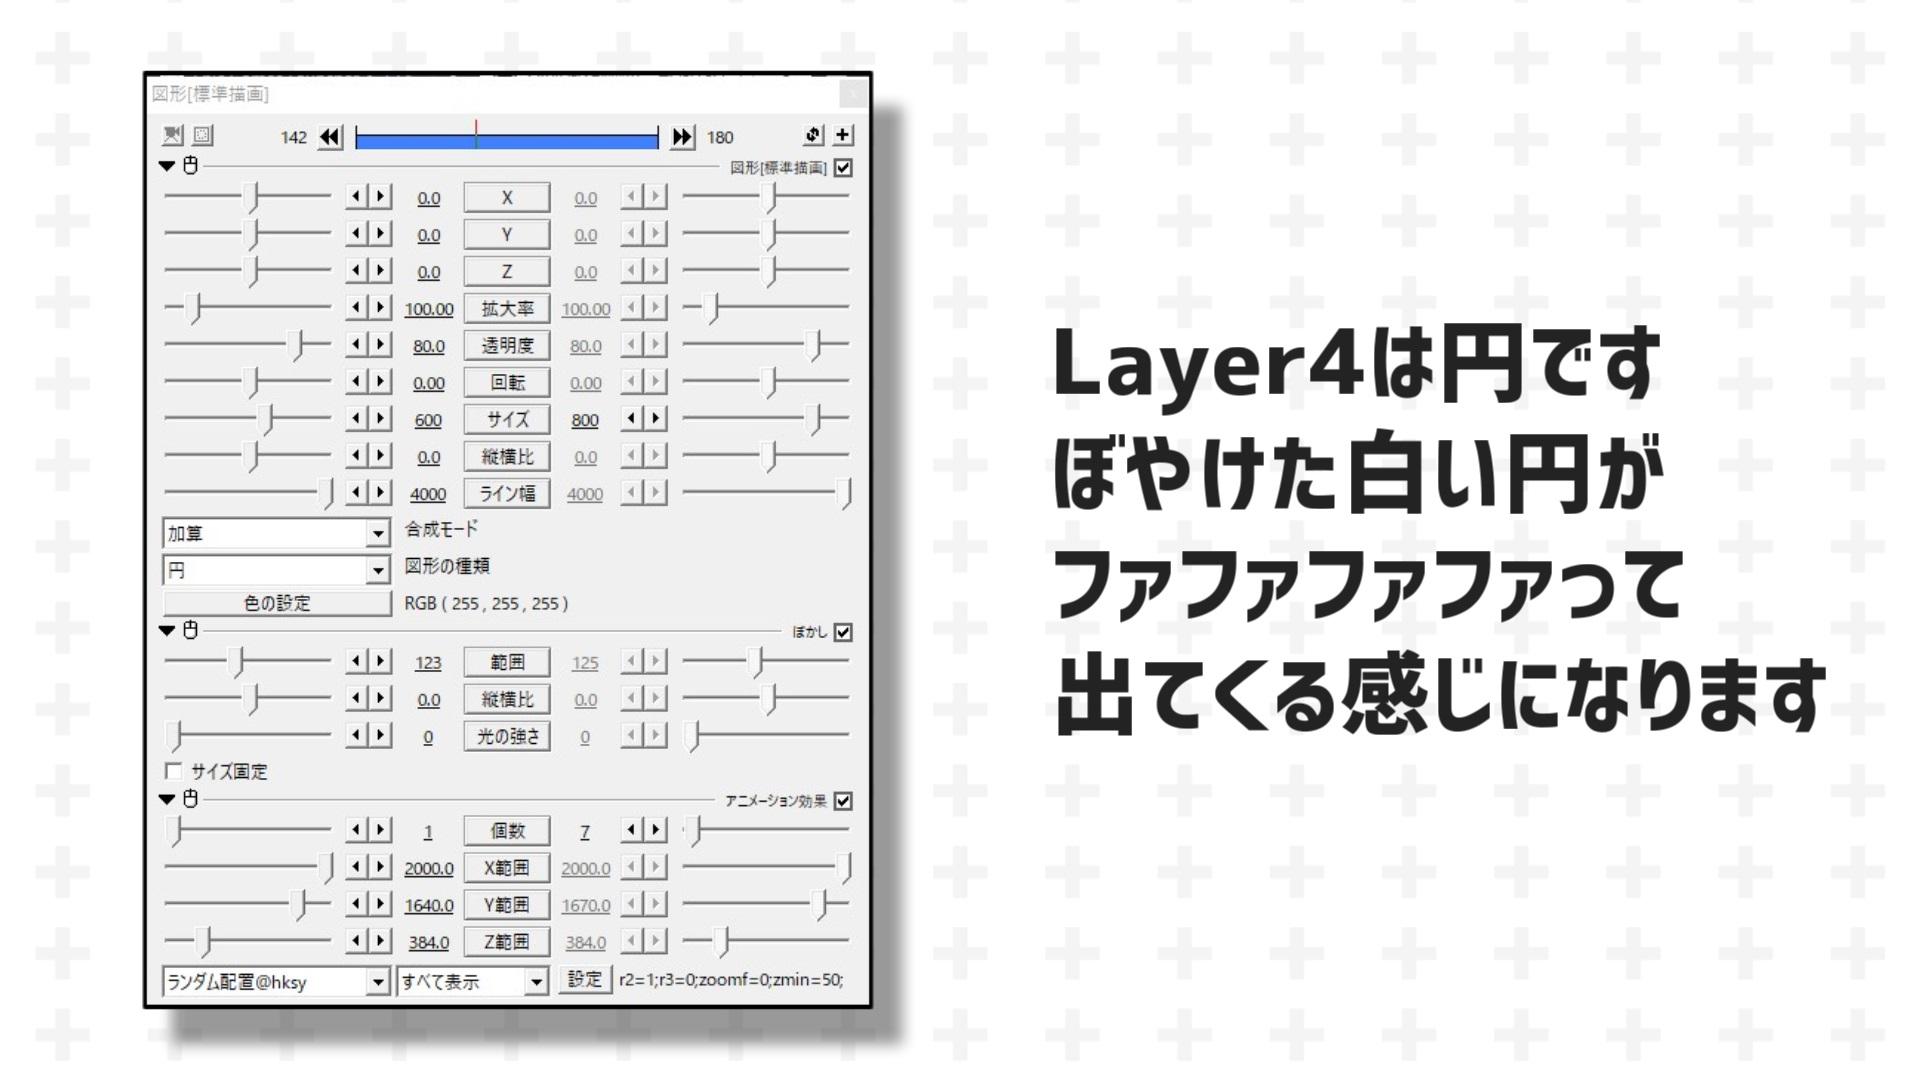 Layer4は円です。ぼやけた白い円がファファファファって出てくる感じになります。